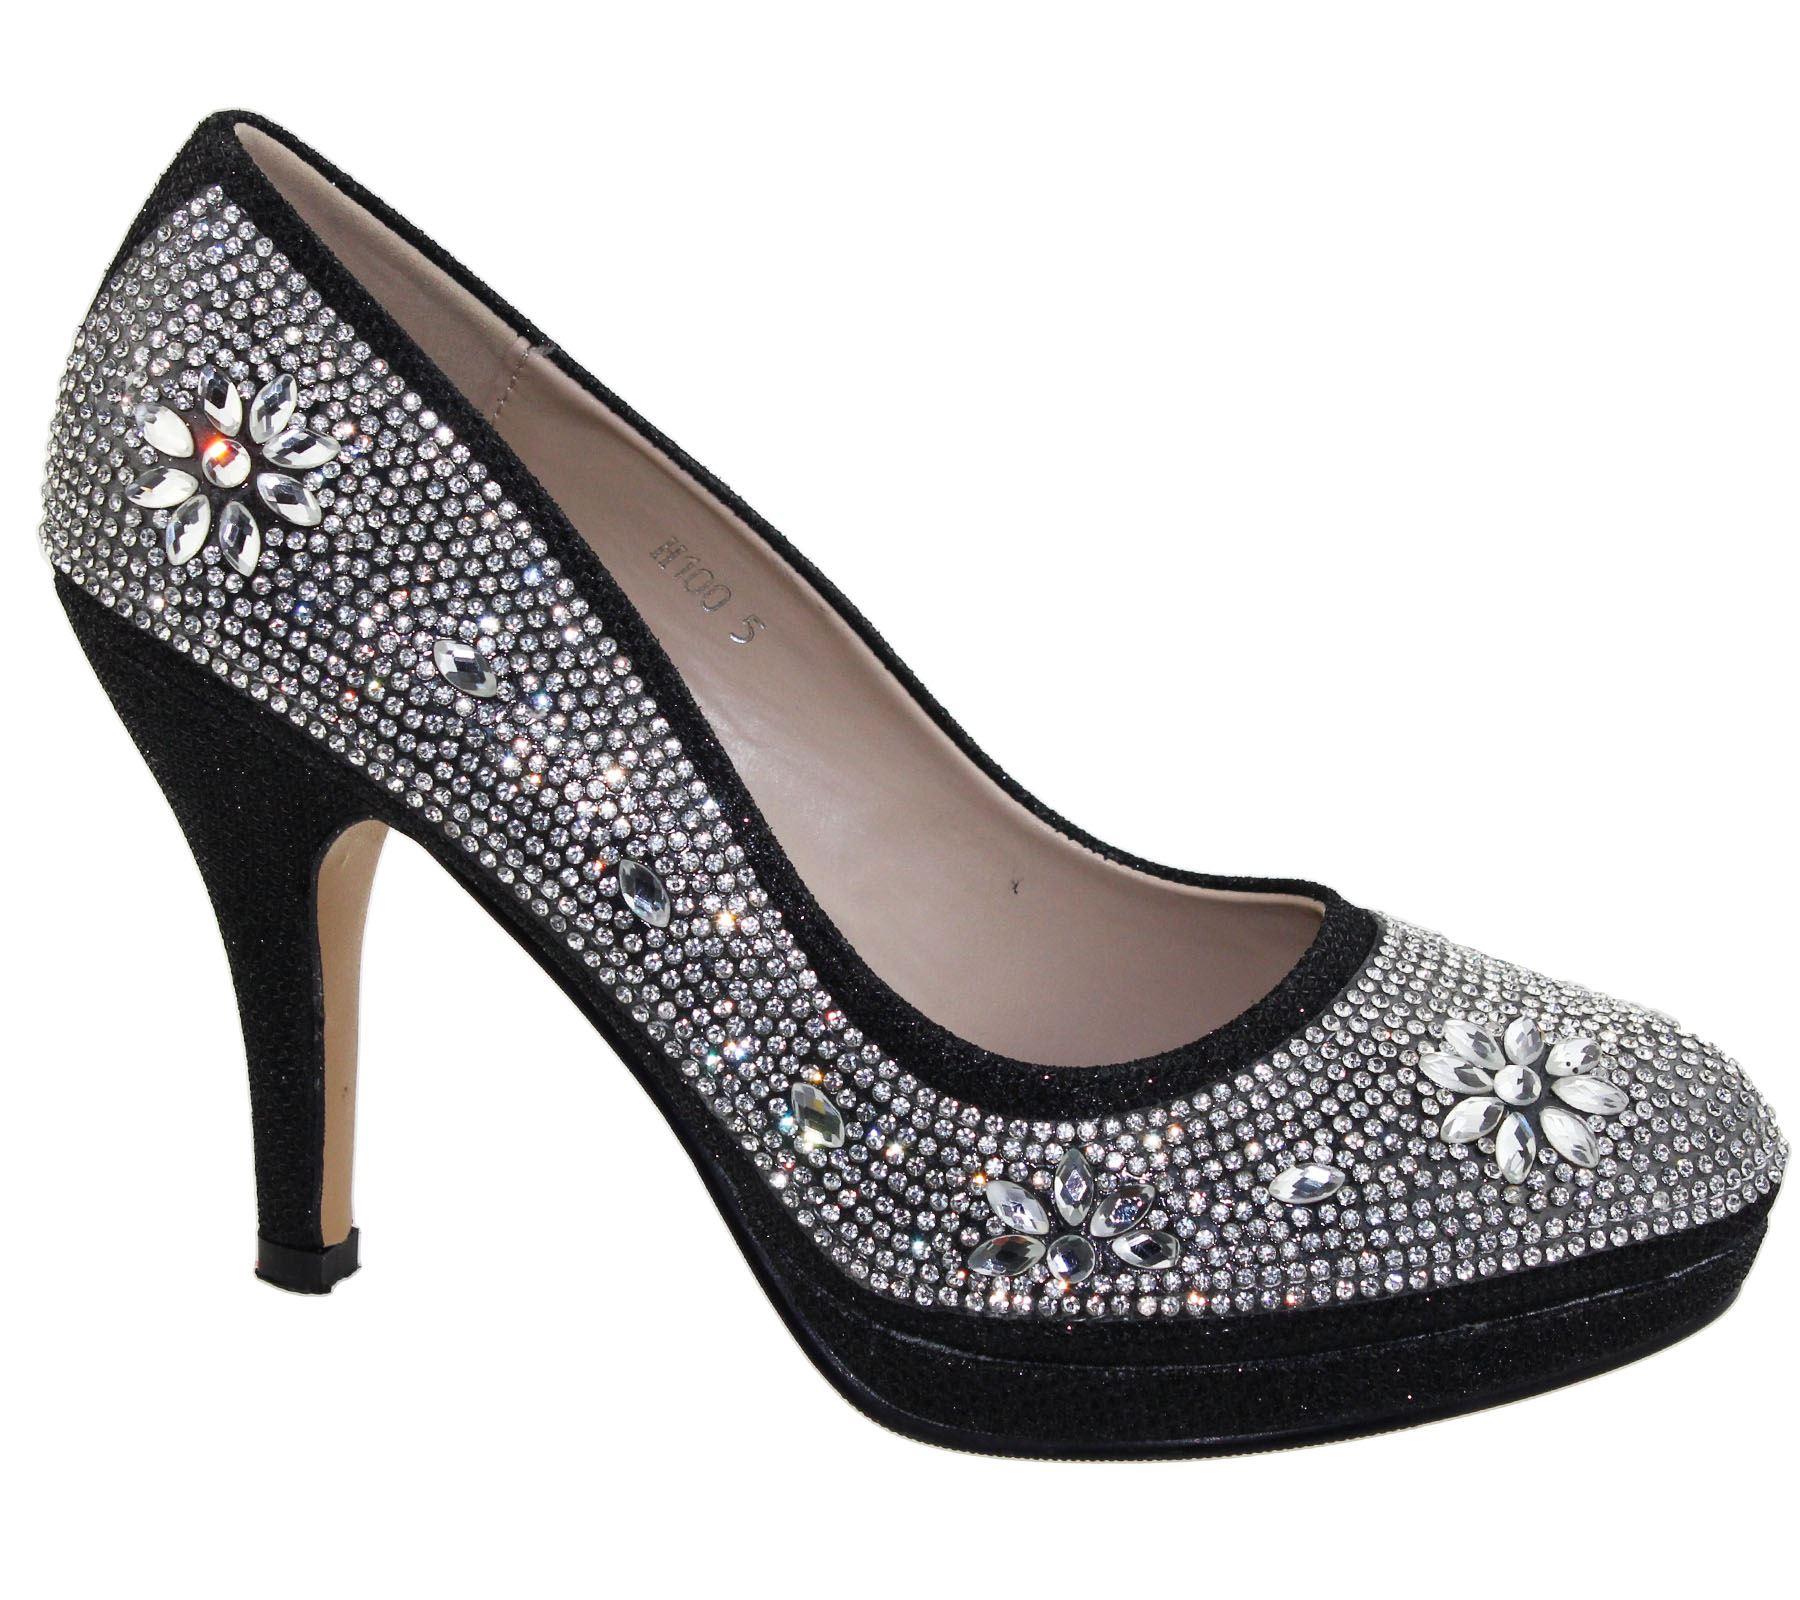 Womens-Platforms-High-Heels-Wedding-Bridal-Evening-Diamante-Ladies-Party-Shoes miniatura 8